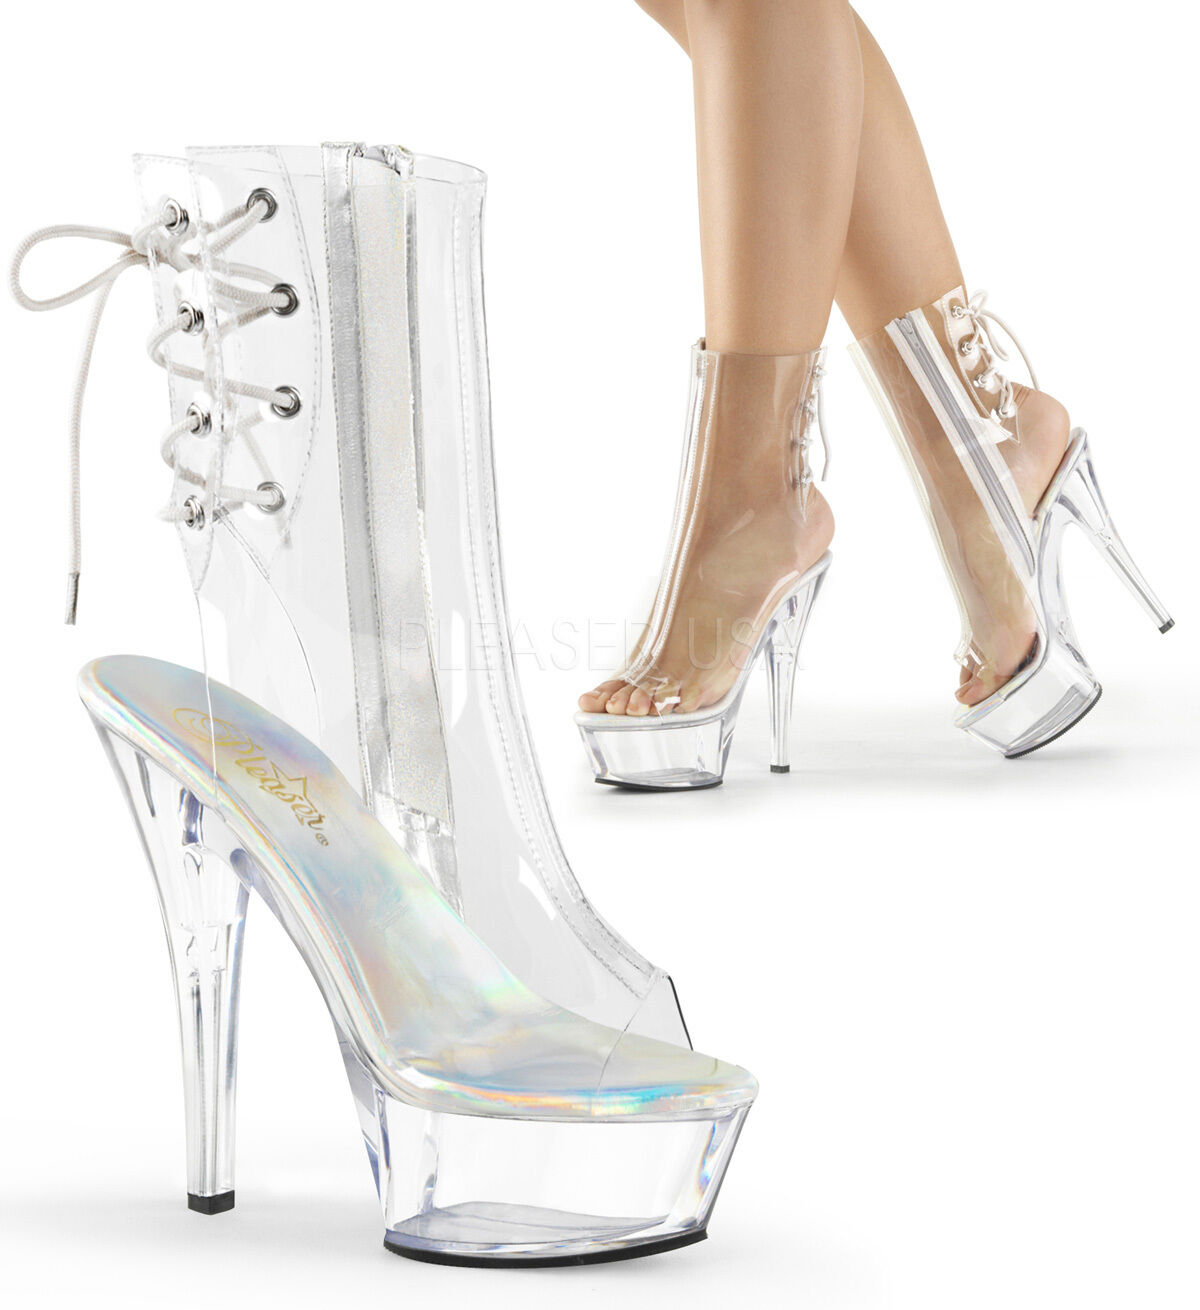 6  de Plástico Transparente Plataforma Con Cordones Tacón Pleaser Pleaser Pleaser Bailarín Stripper botas talla 7 8 9  Venta barata